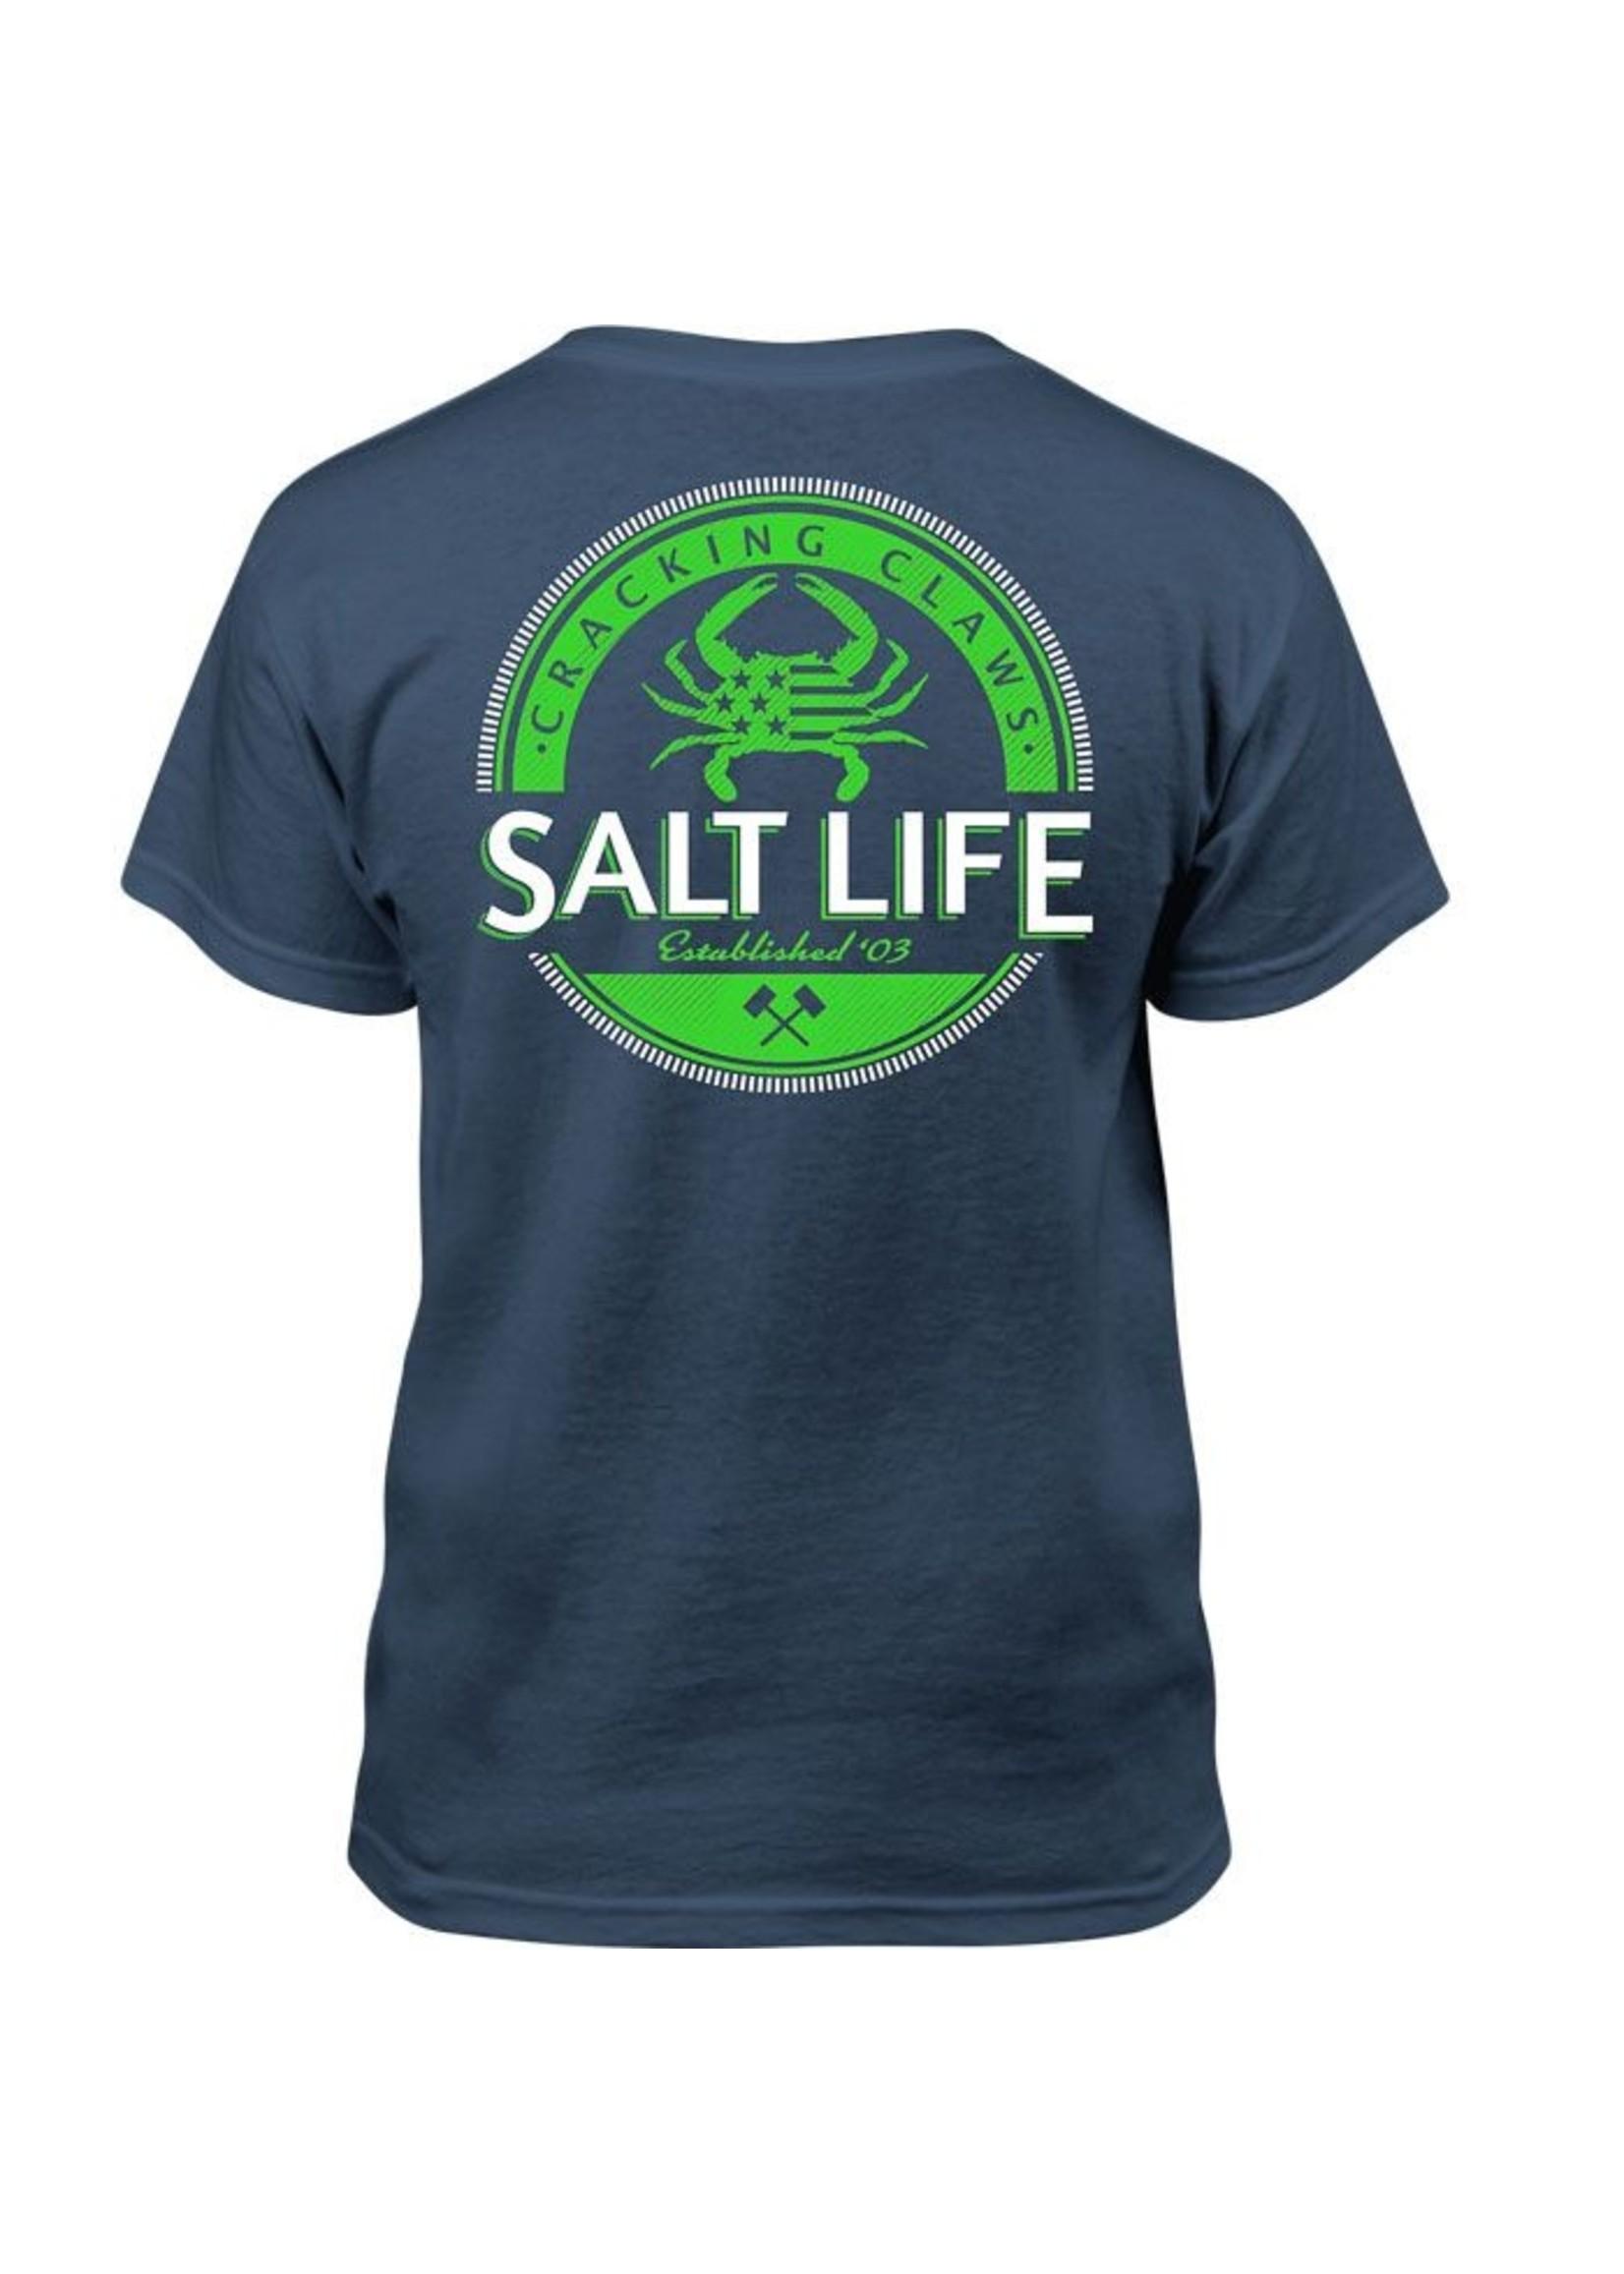 Salt Life Back Fin Youth Tee